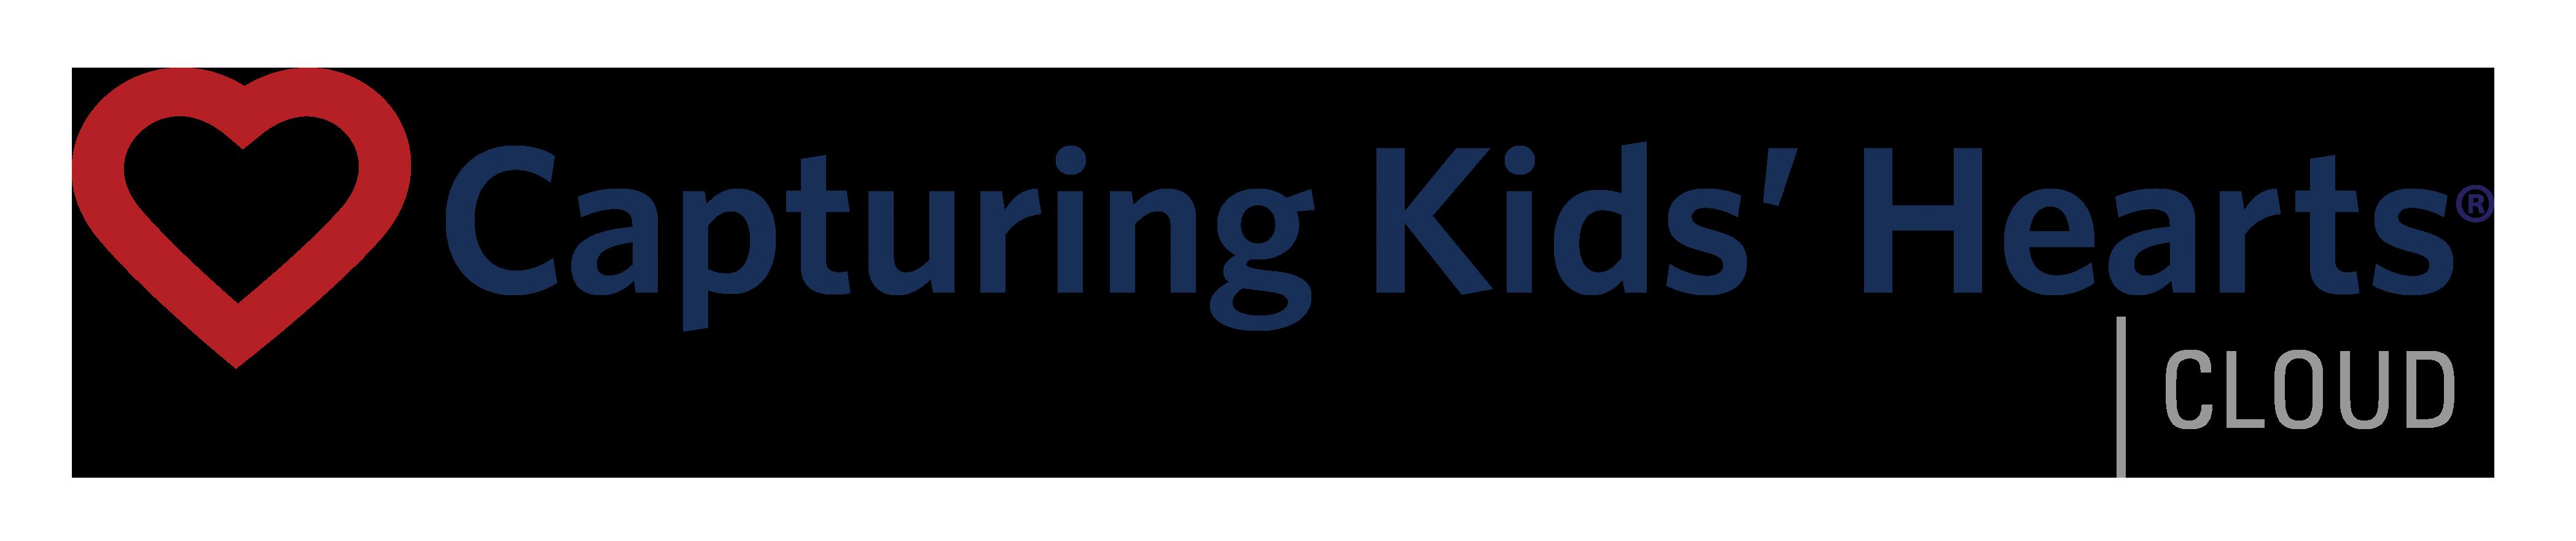 Capturing Kids' Hearts Cloud